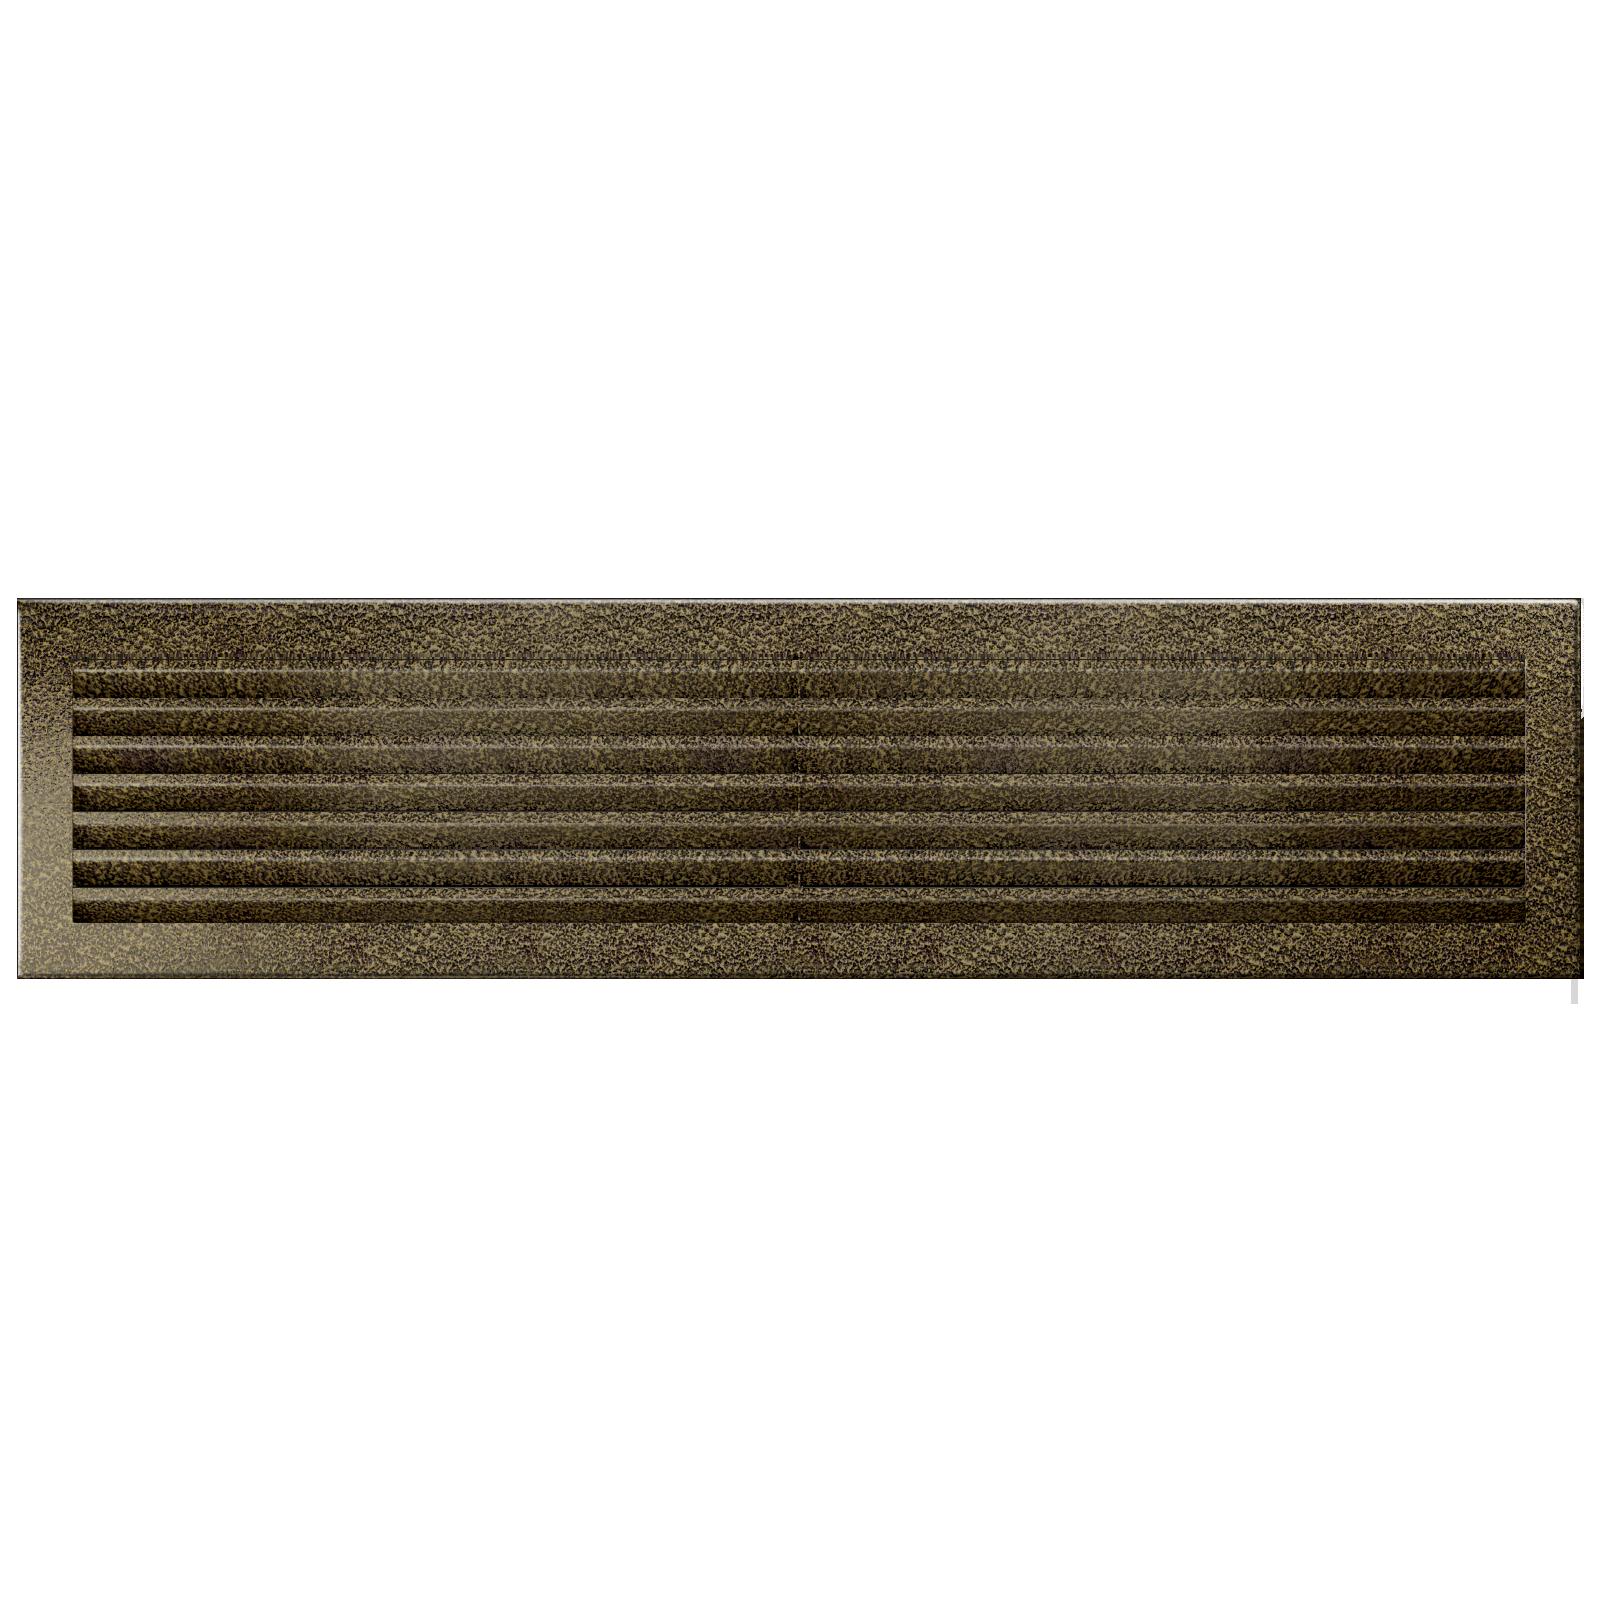 Grila FRESH NEGRU-AURIU 17x70